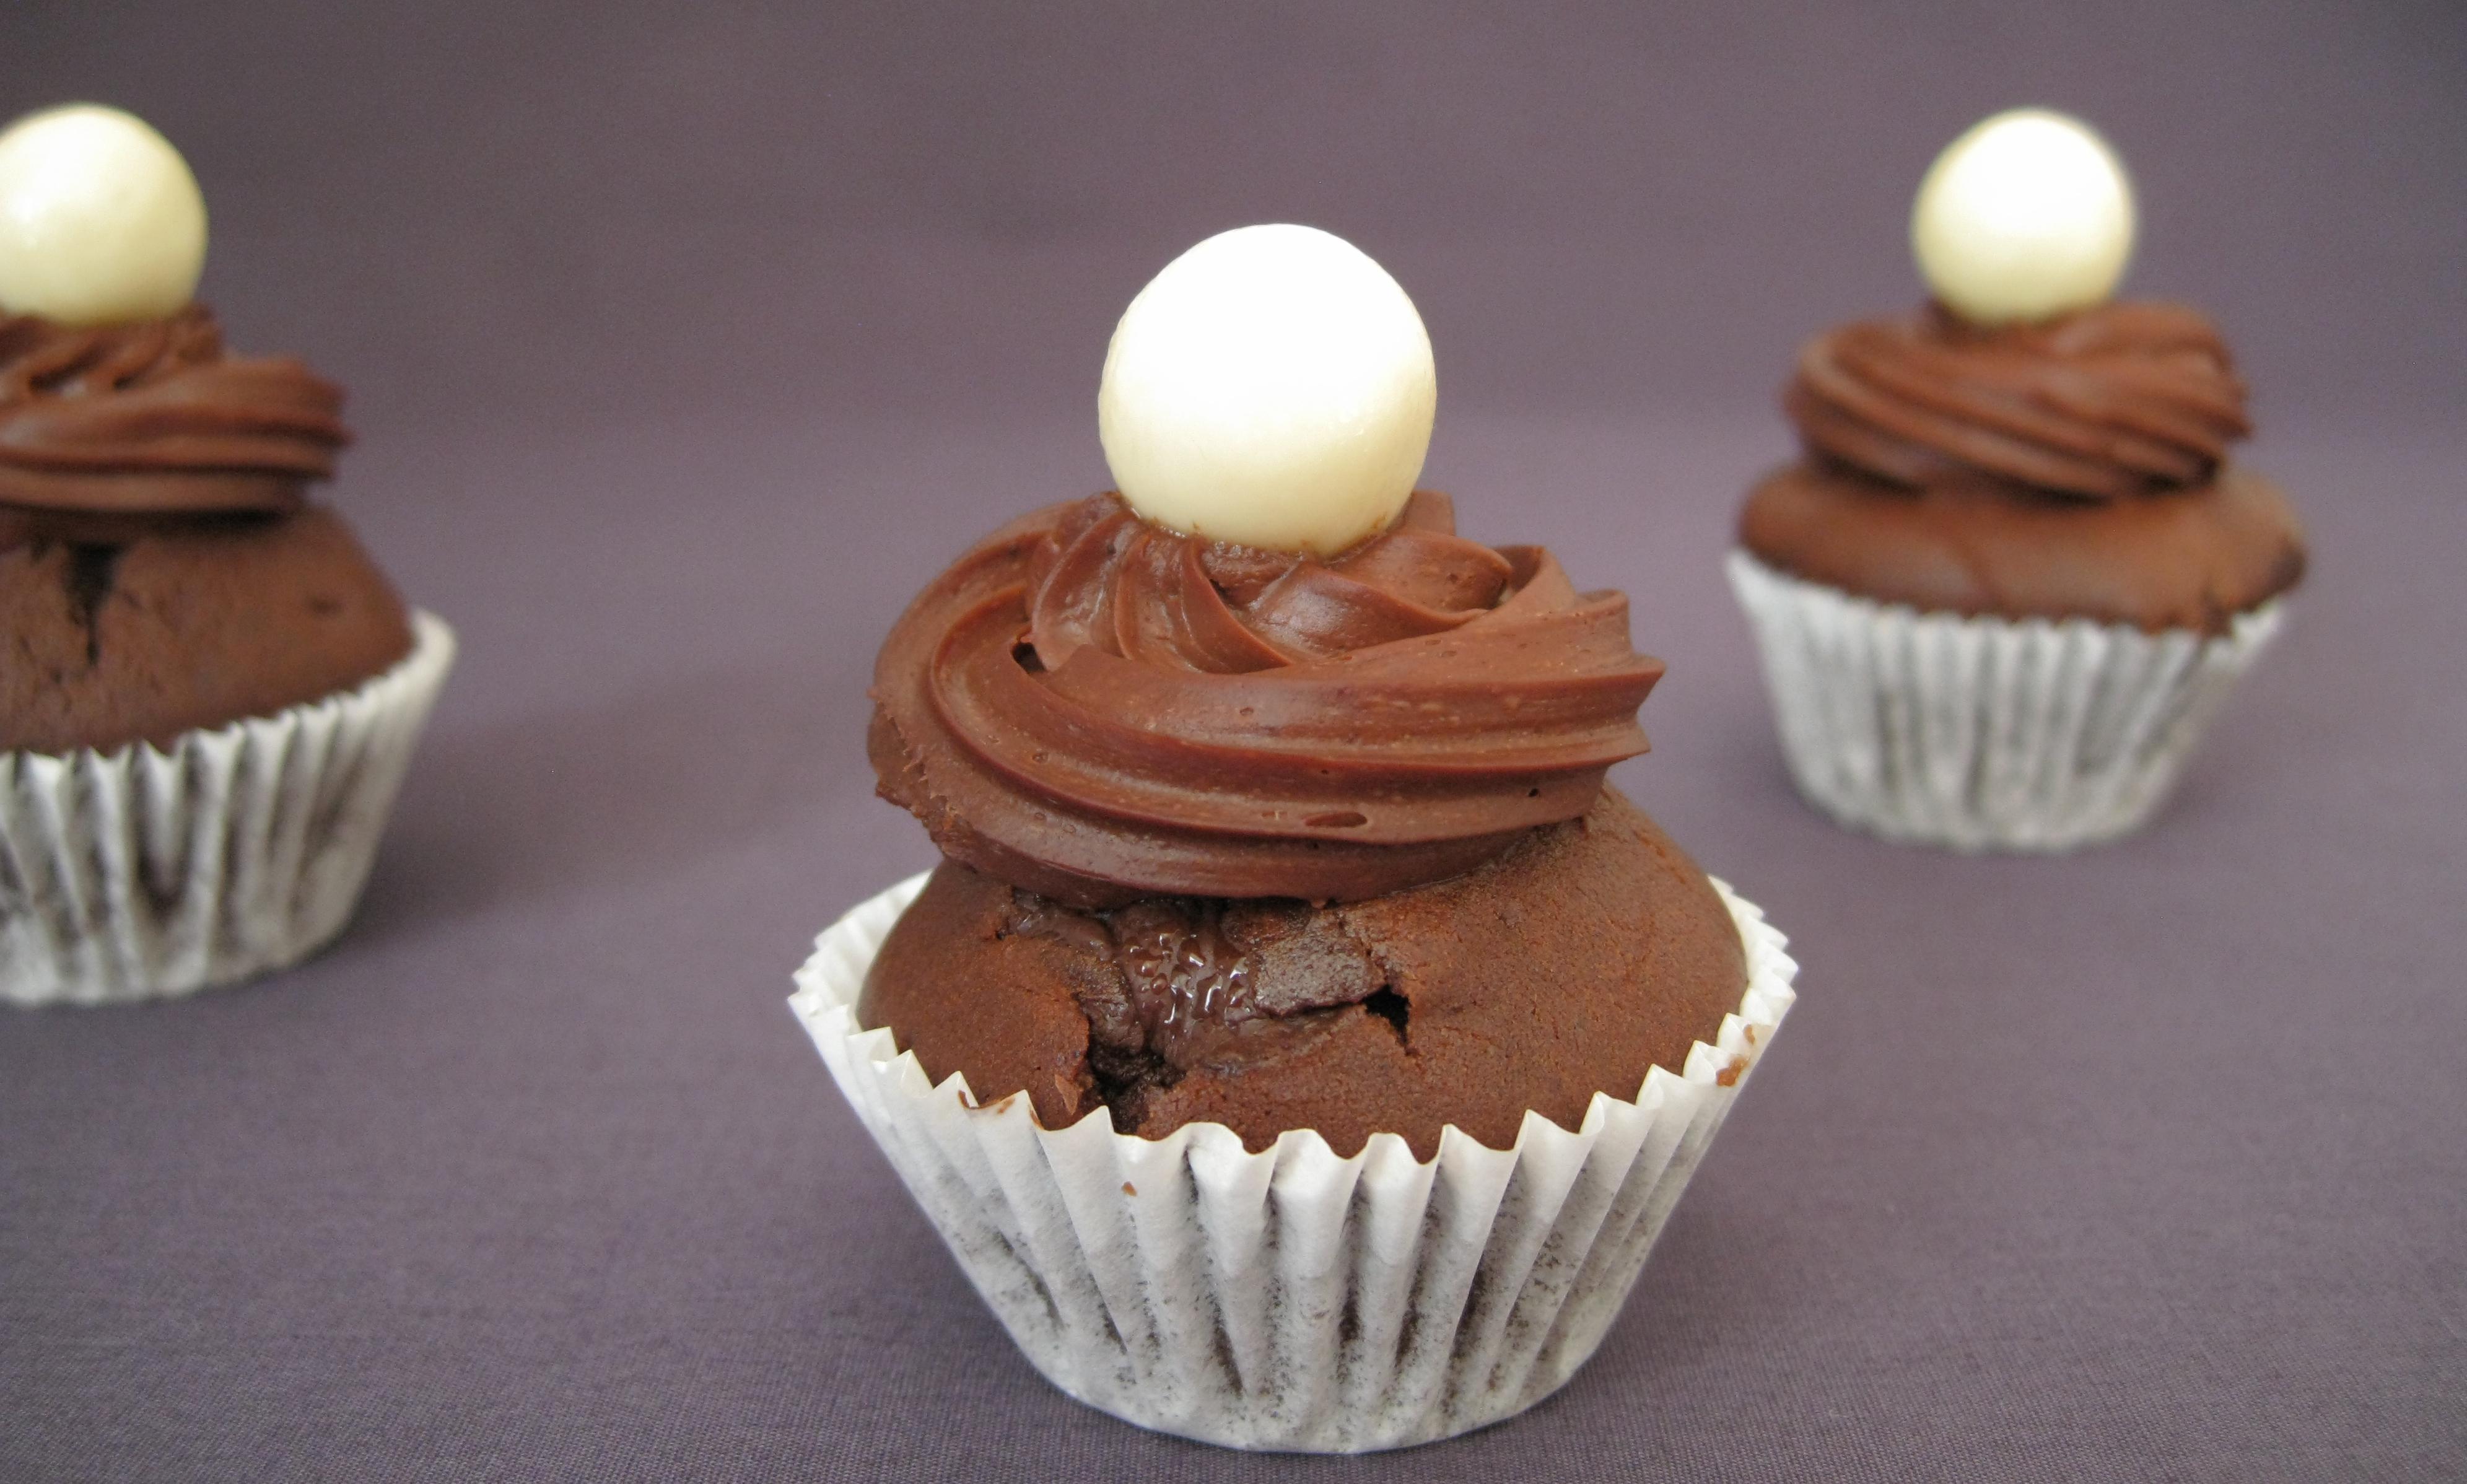 (c) Cupcake-fribourg.ch